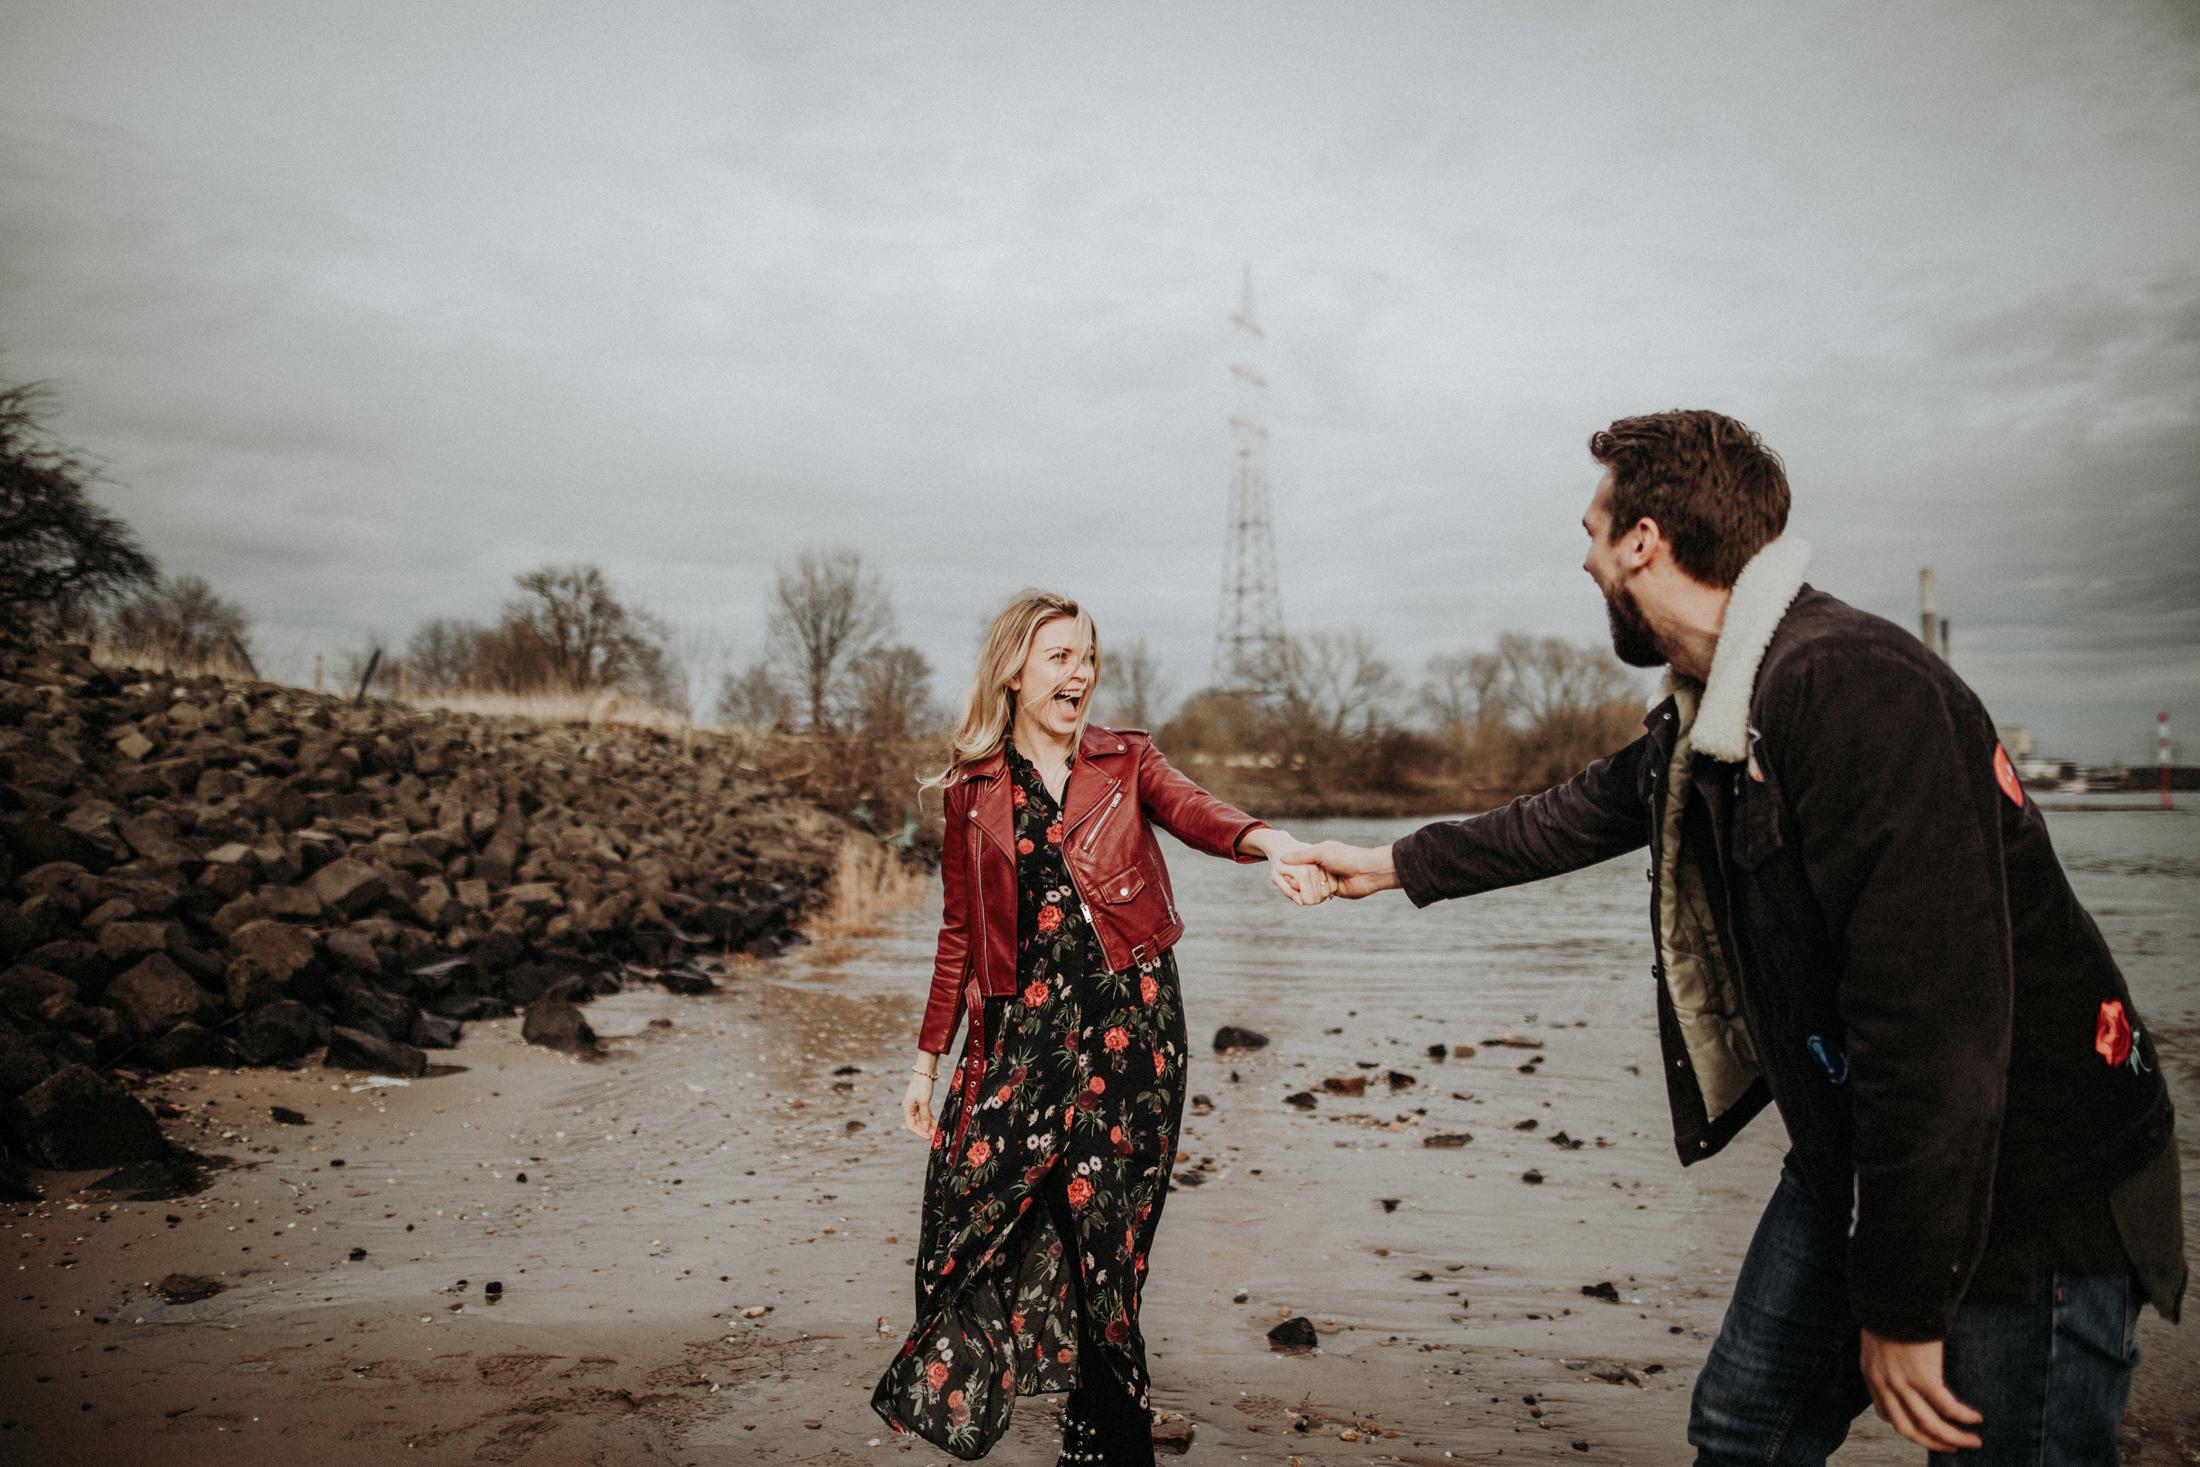 Wedding_Photographer_Mallorca_DanielaMarquardt_Photography_CanaryIslands_Lanzarote_Iceland_Tuscany_Santorini_Portugal_NewYork_Spain_Elopement_Hochzeitsfotograf_CK8